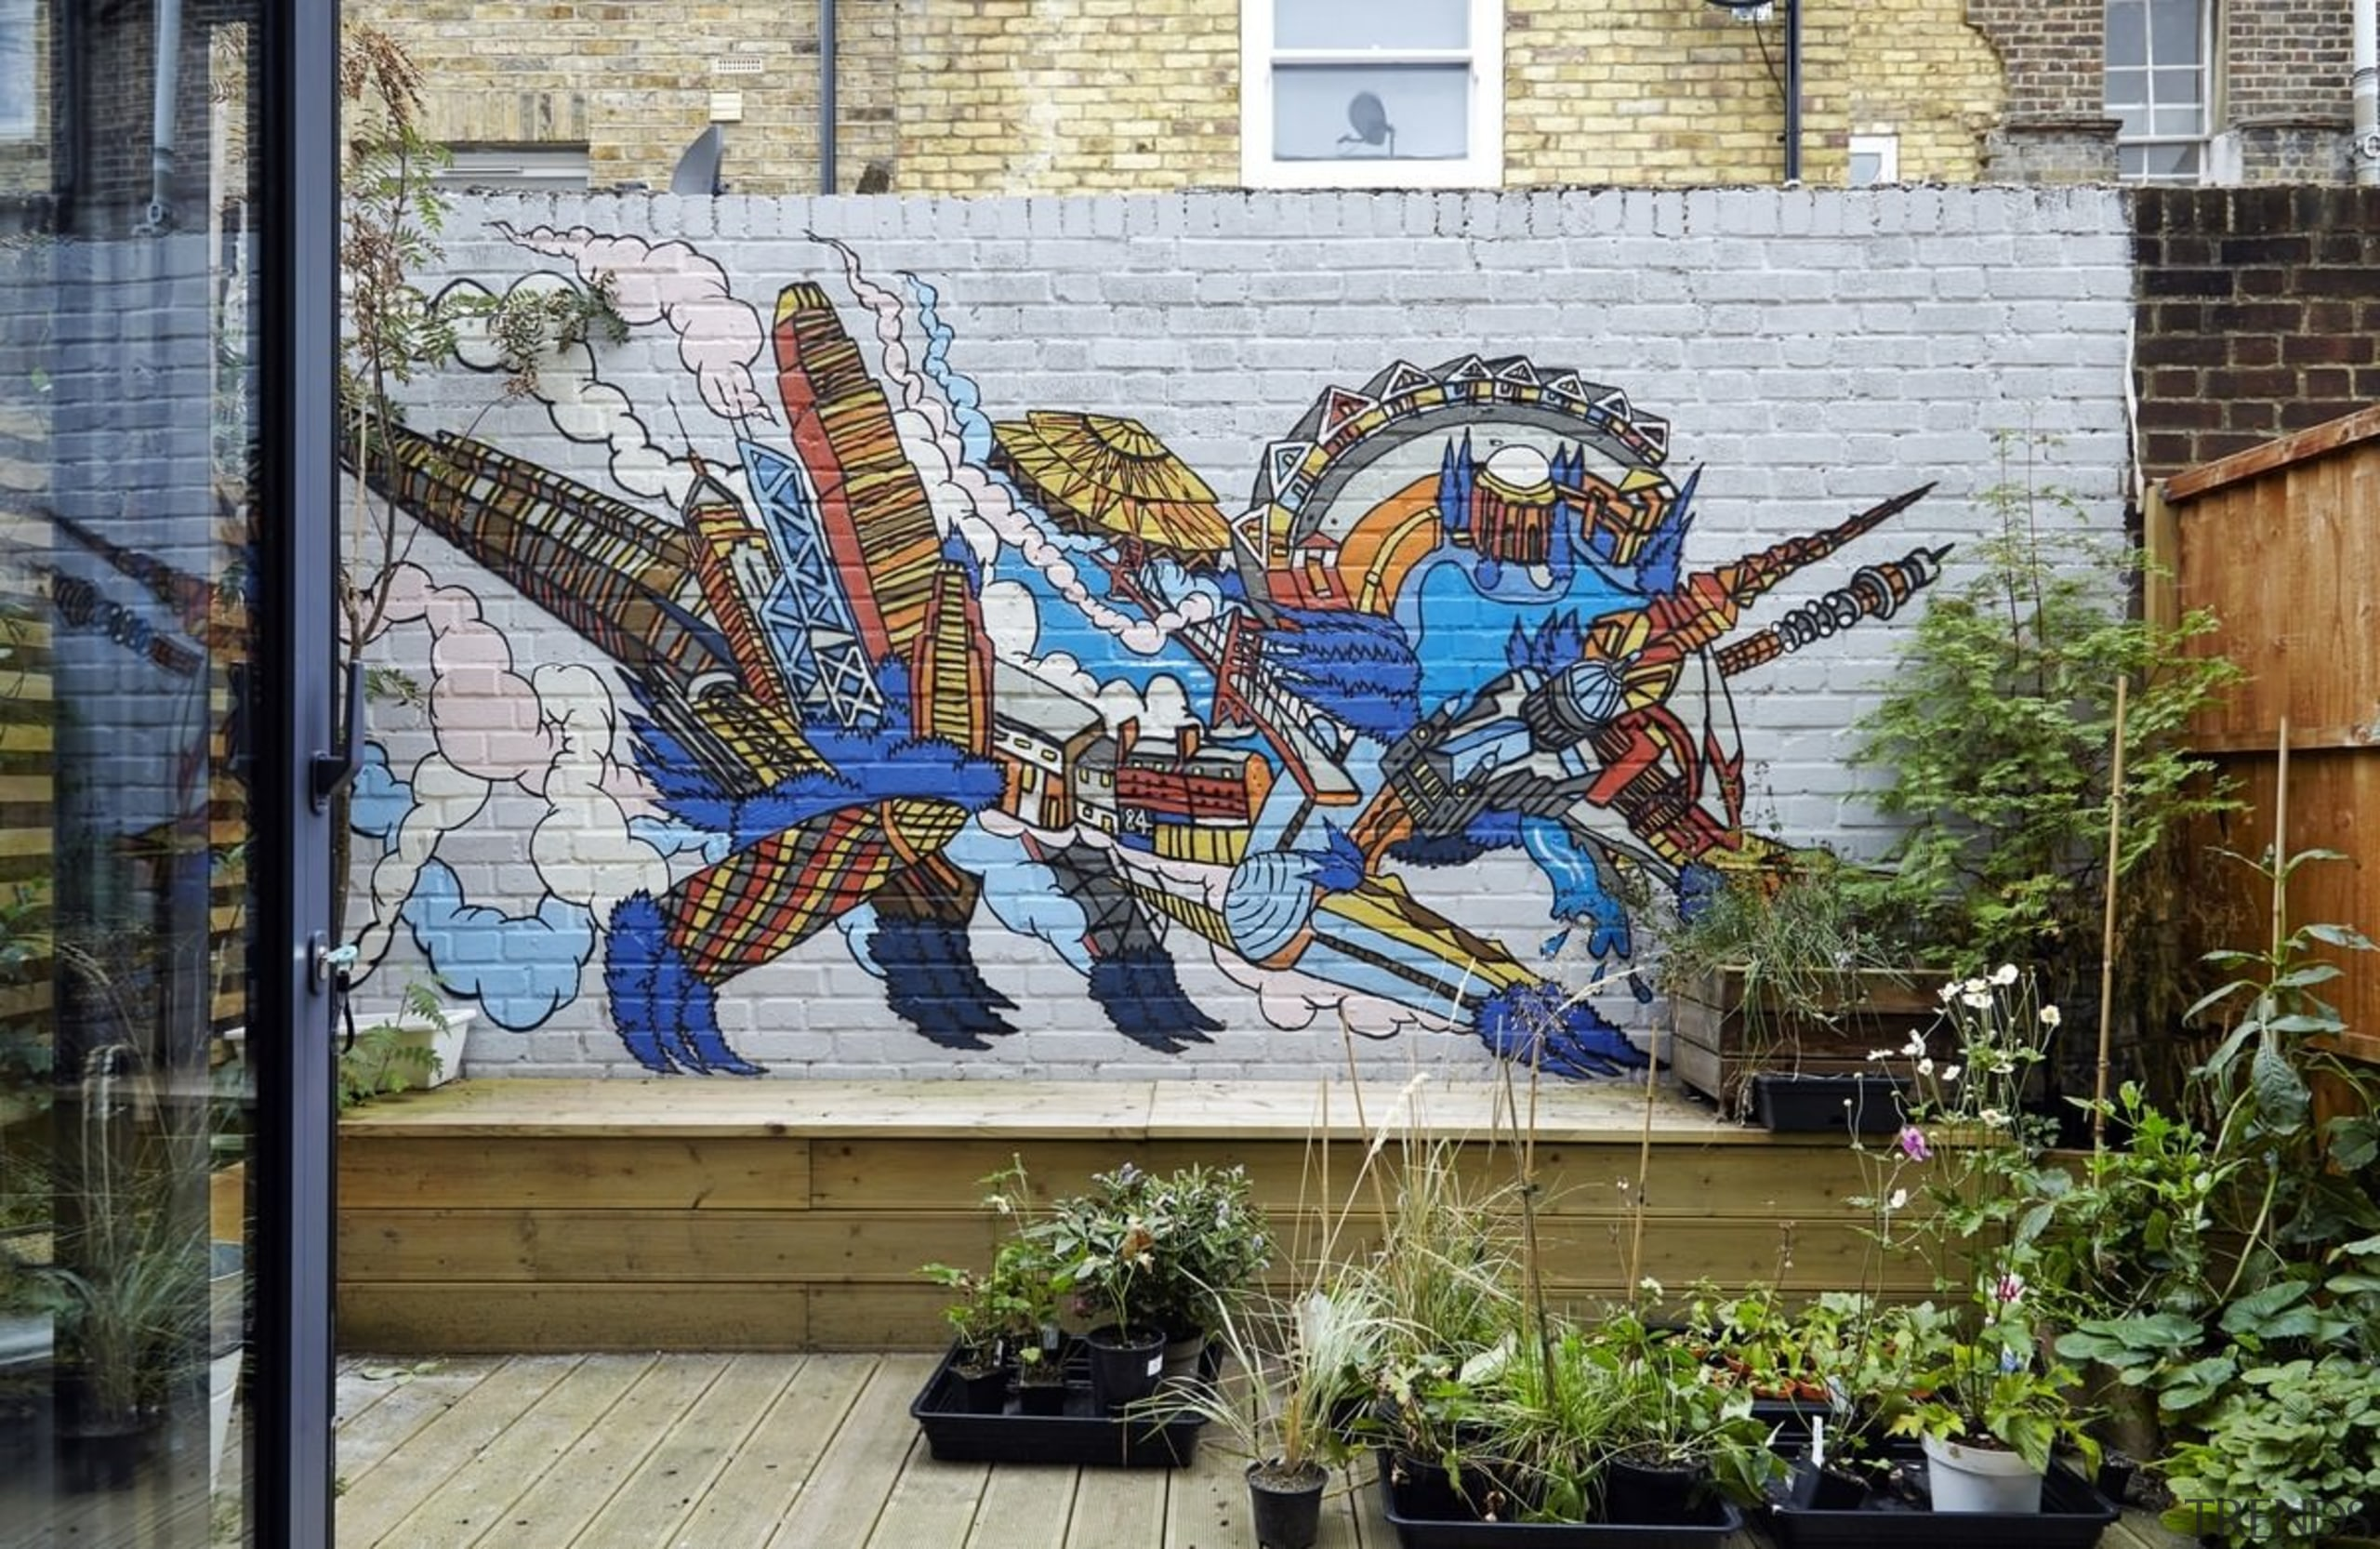 An interesting painting in the back garden draws art, graffiti, mural, street art, wall, gray